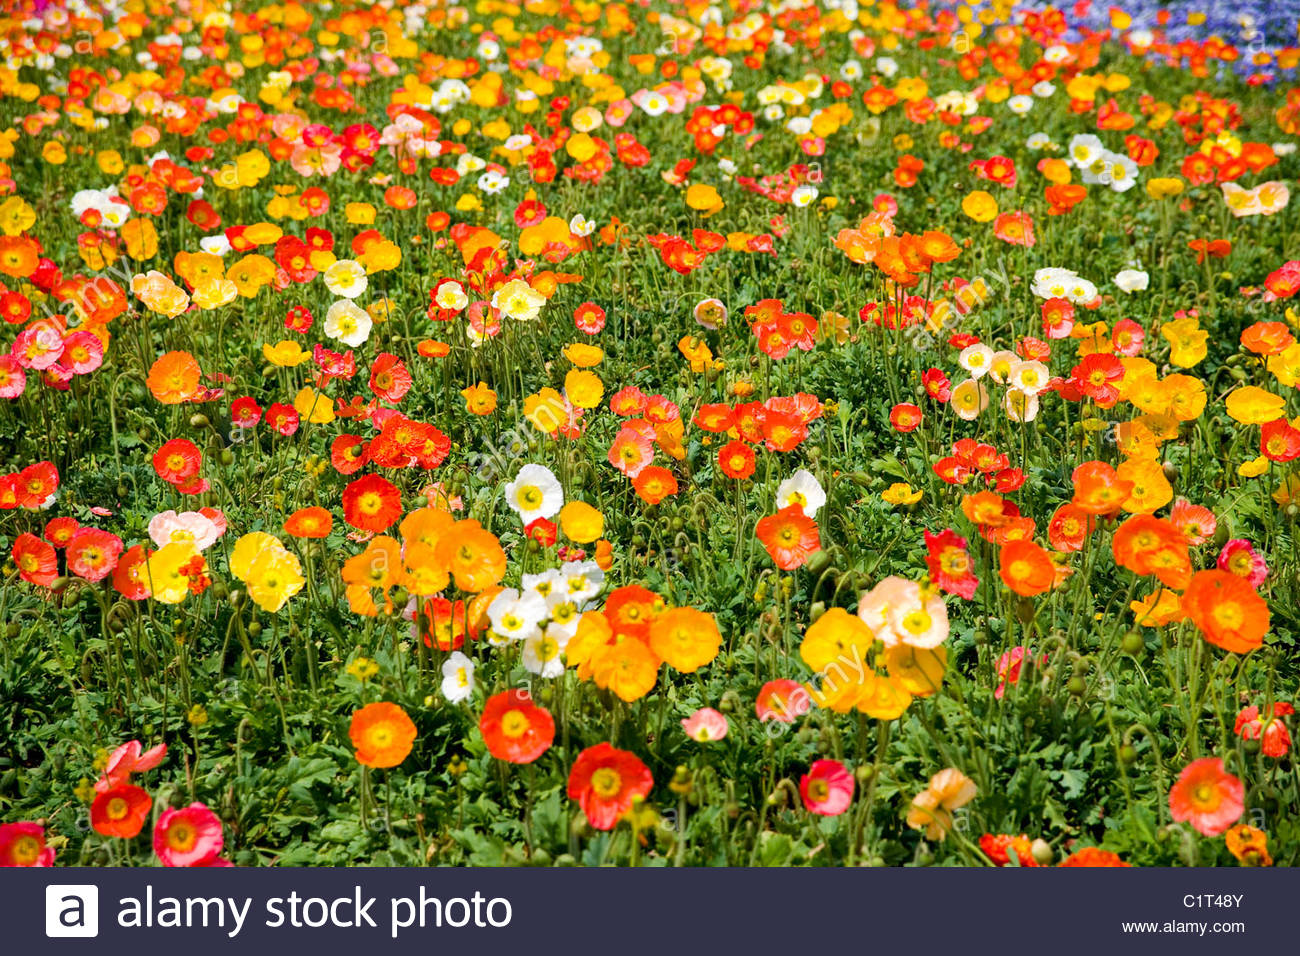 World Horticultural Expo Garden, Kunming, Yunnan, China Stock Photo